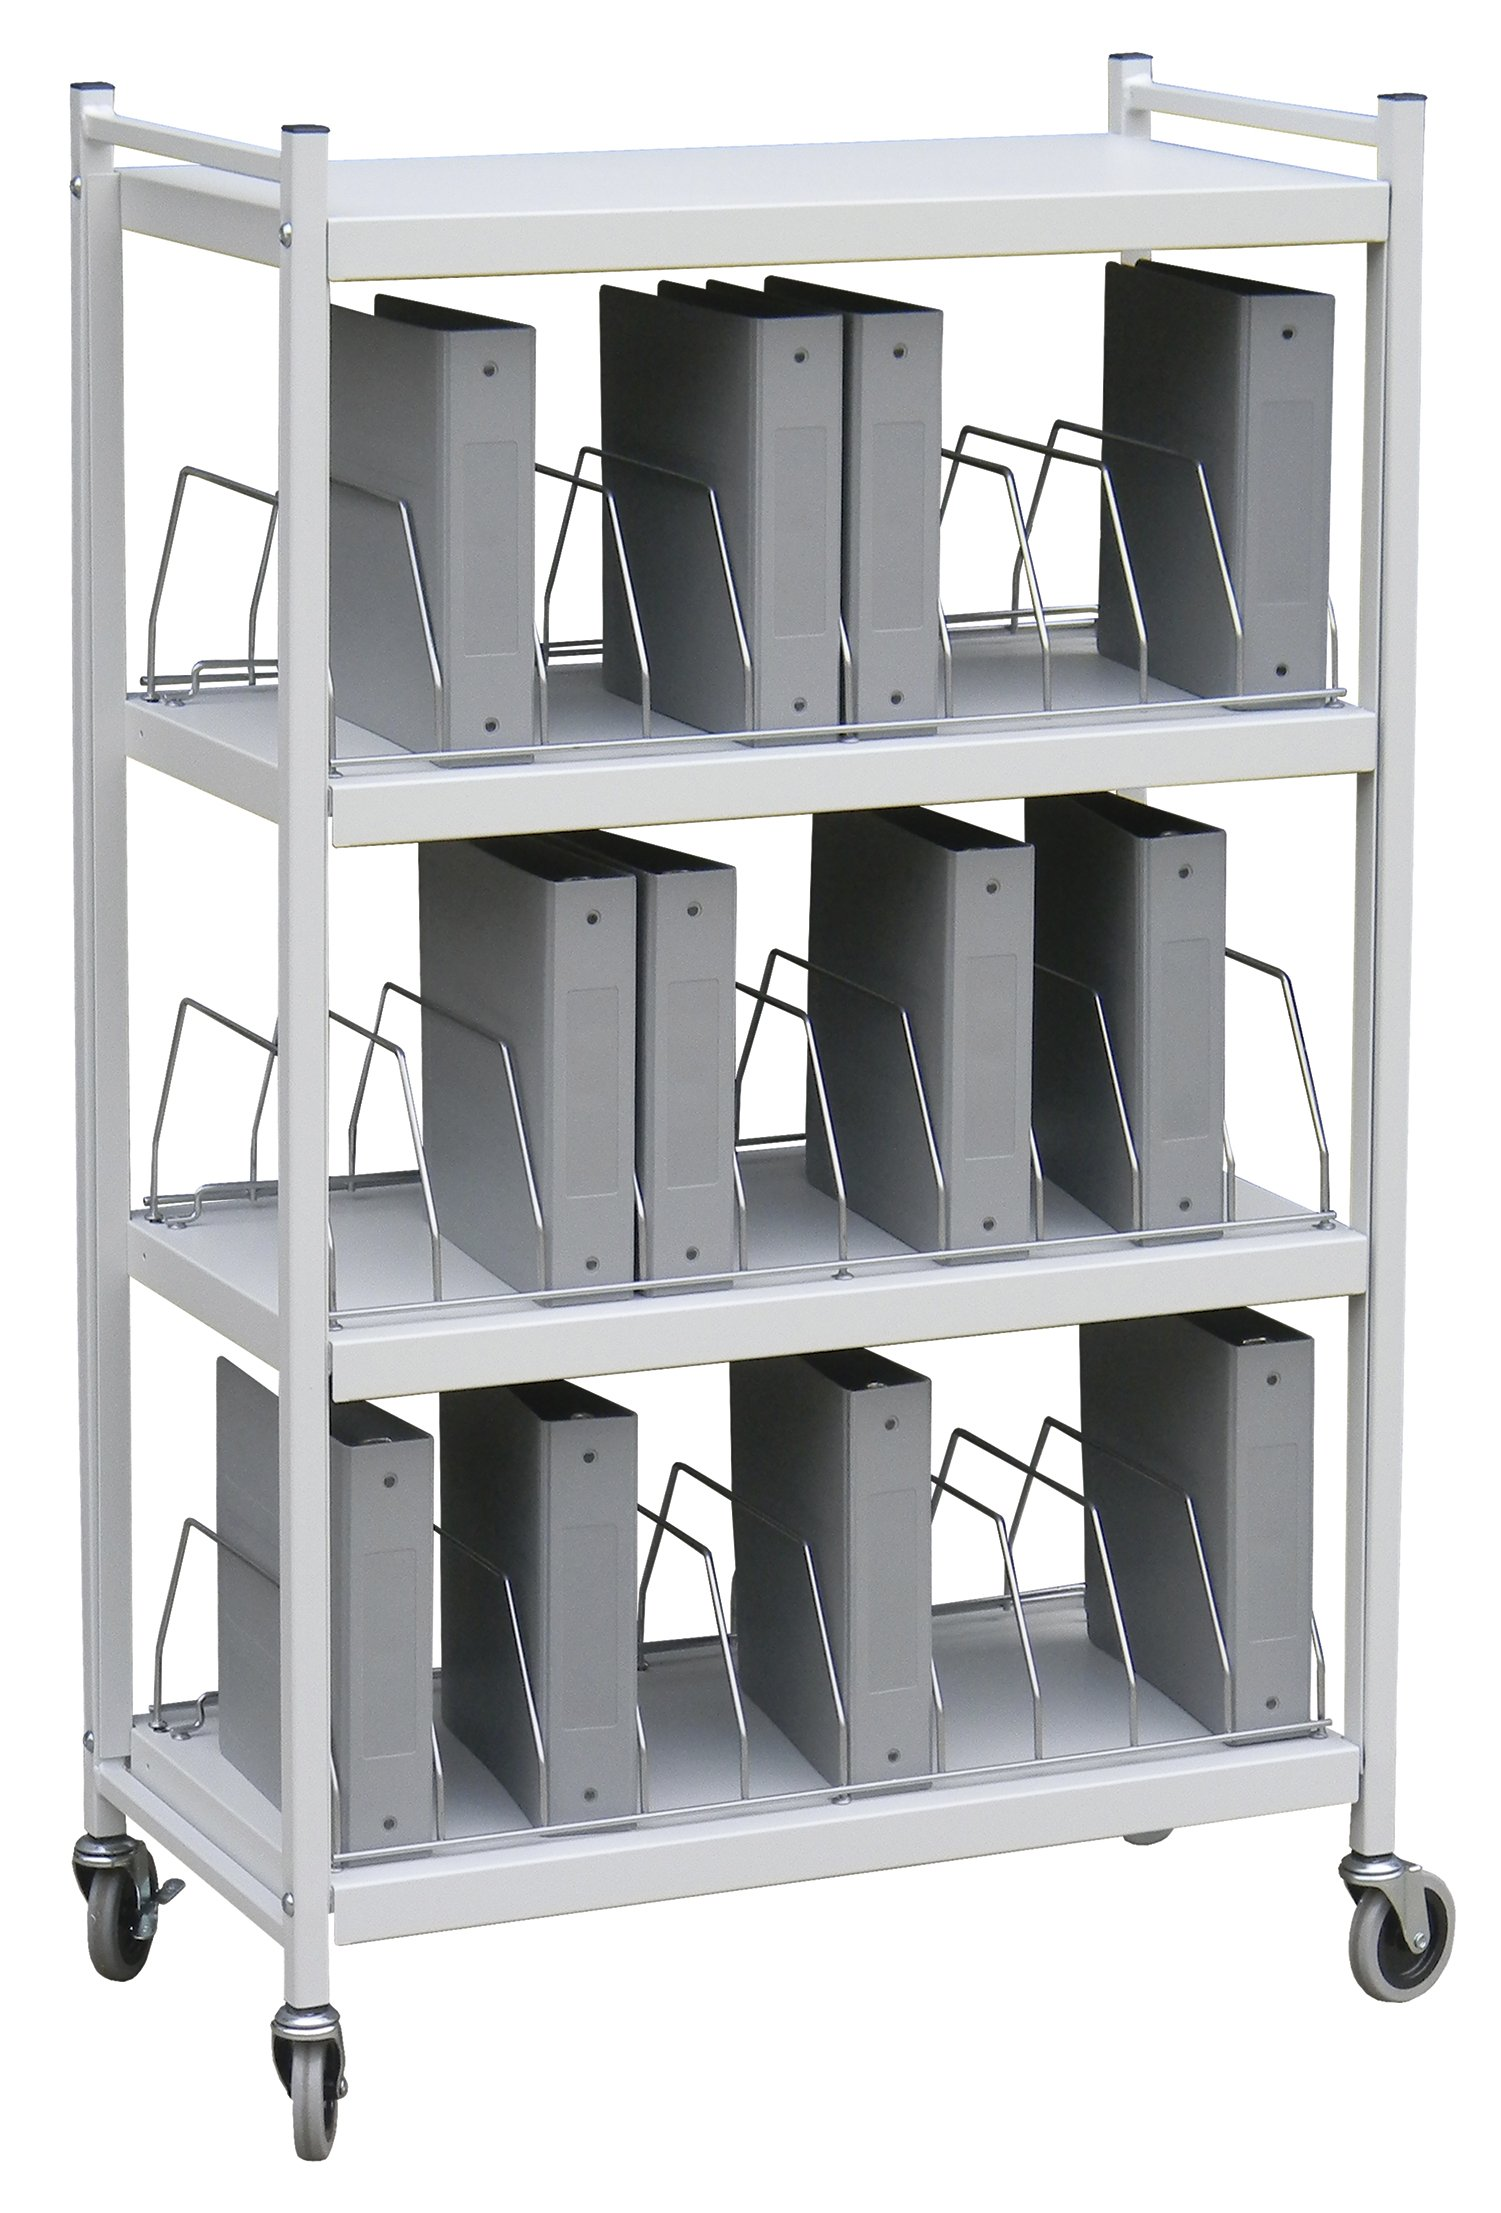 Standard Vertical Open Chart Rack 4 Shelves 30 Binder Capacity (Light Gray)